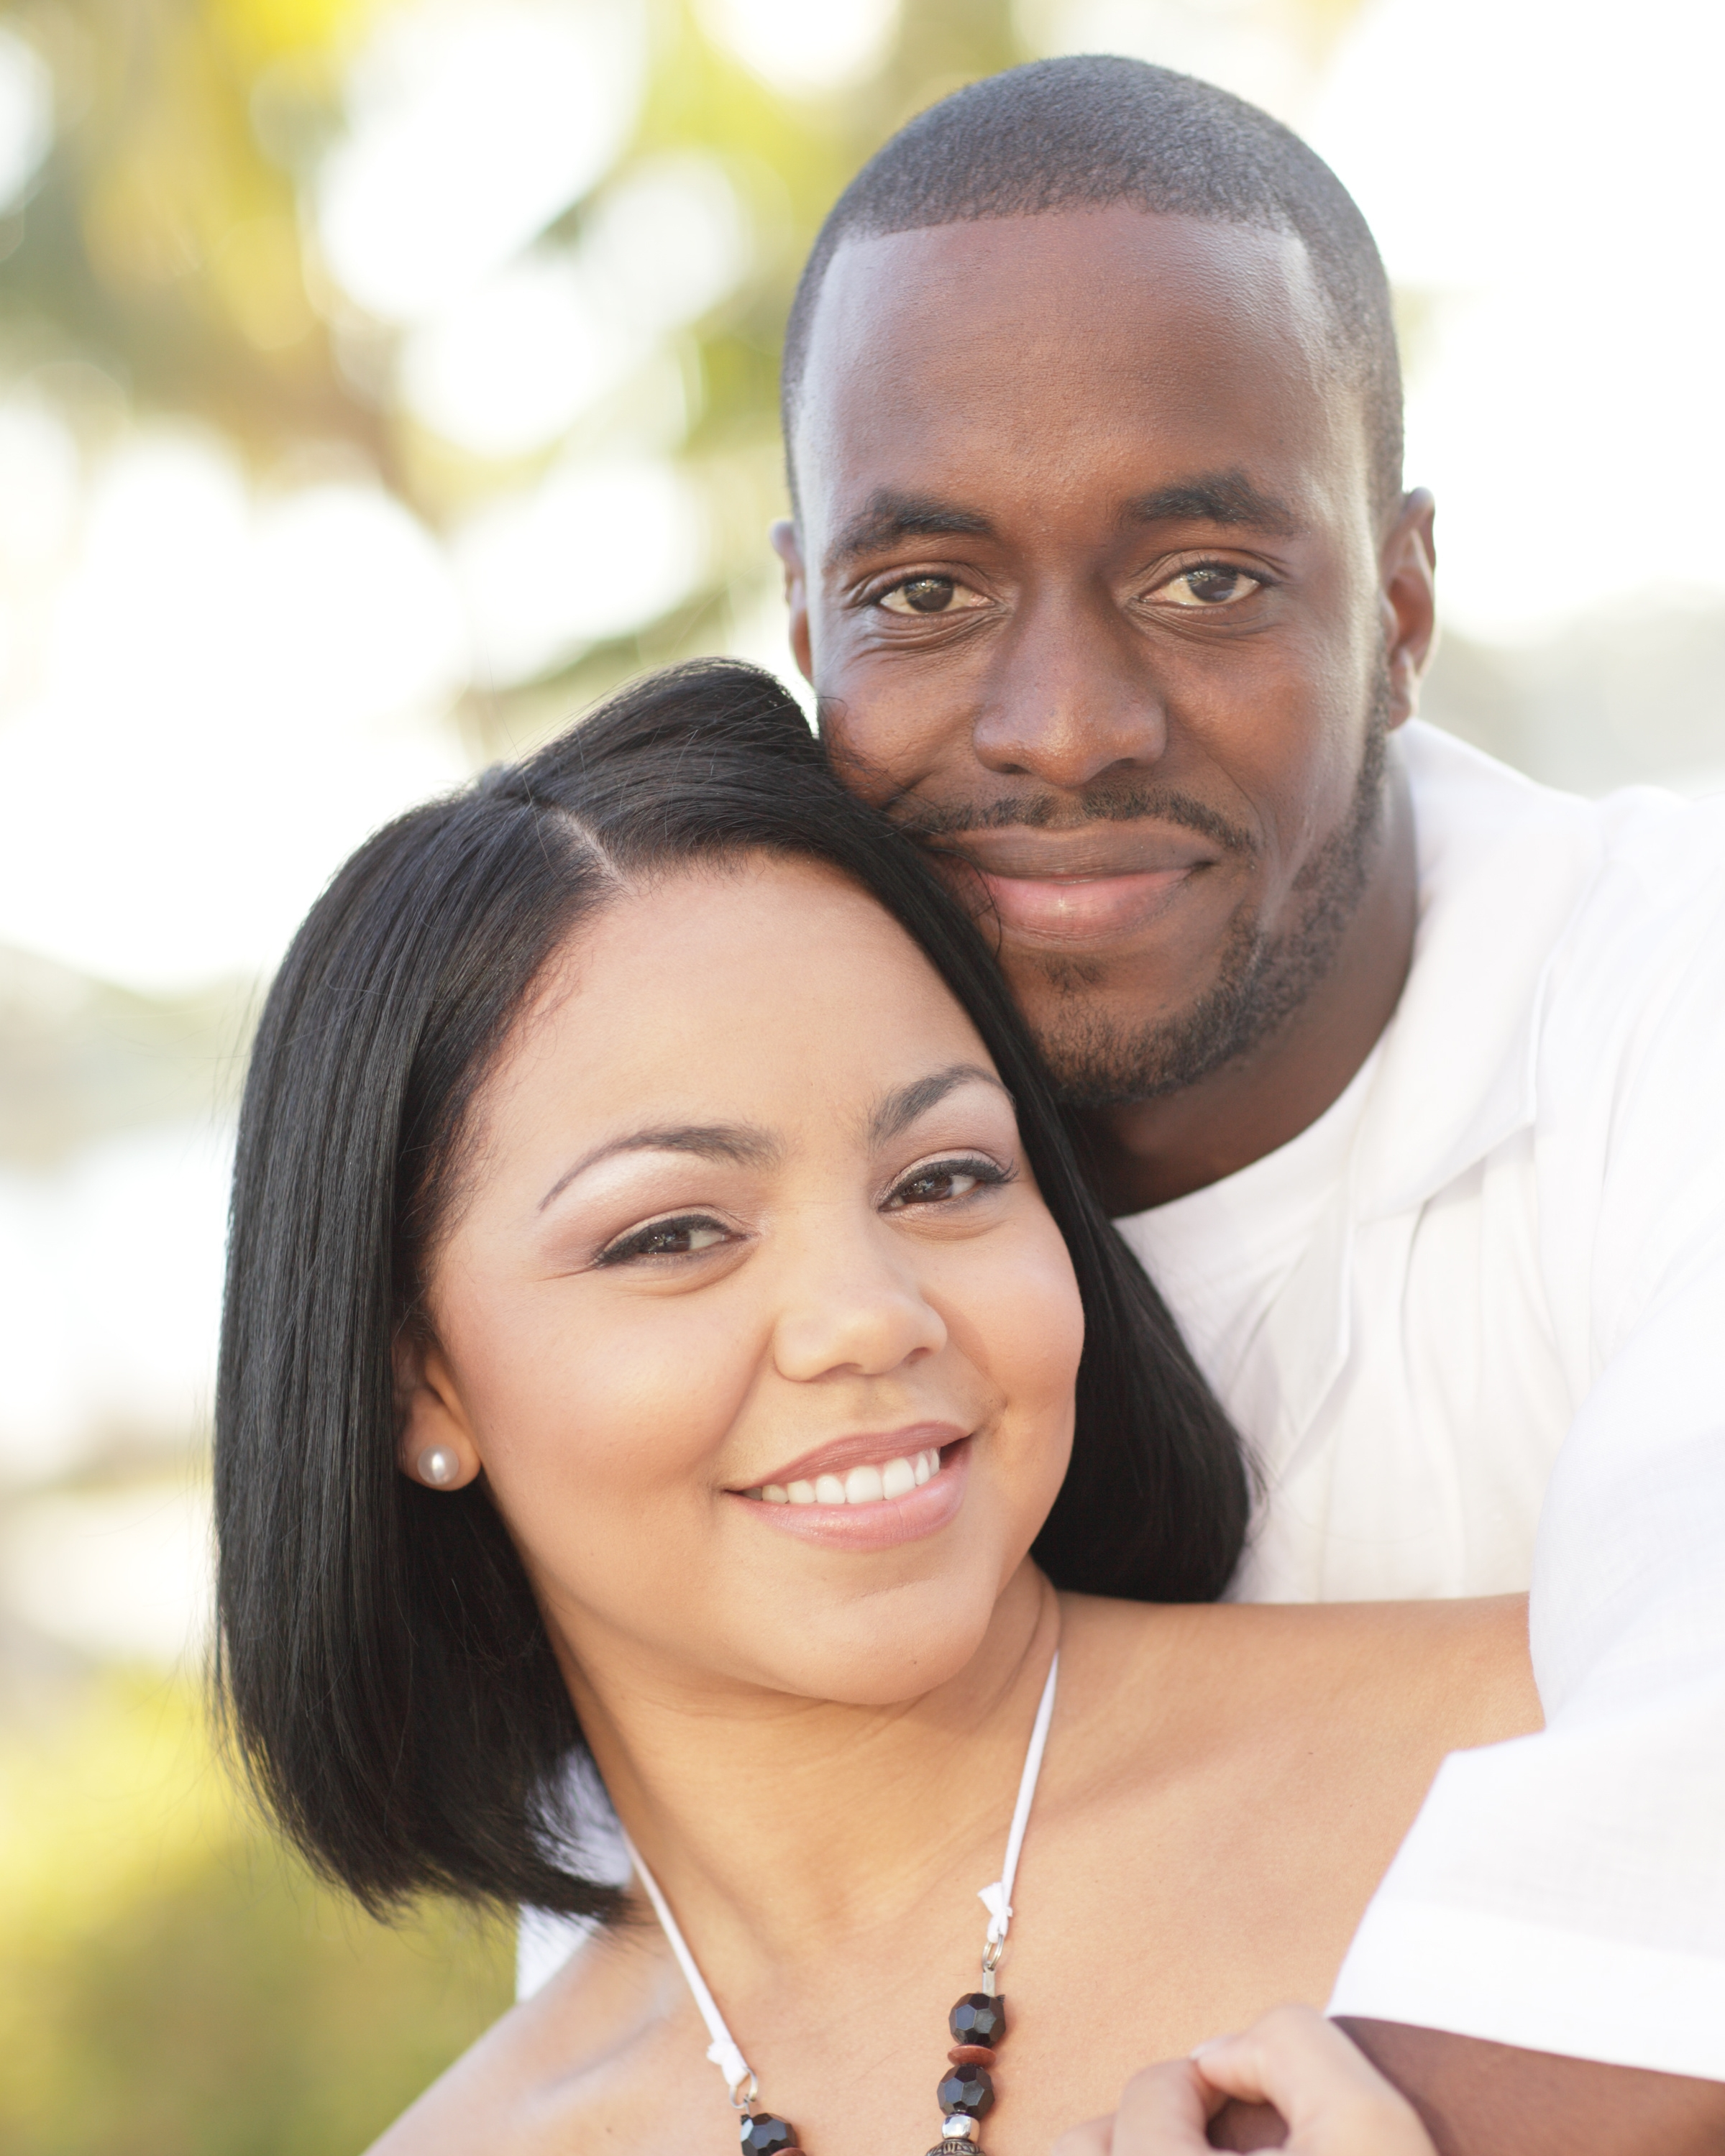 single young couple